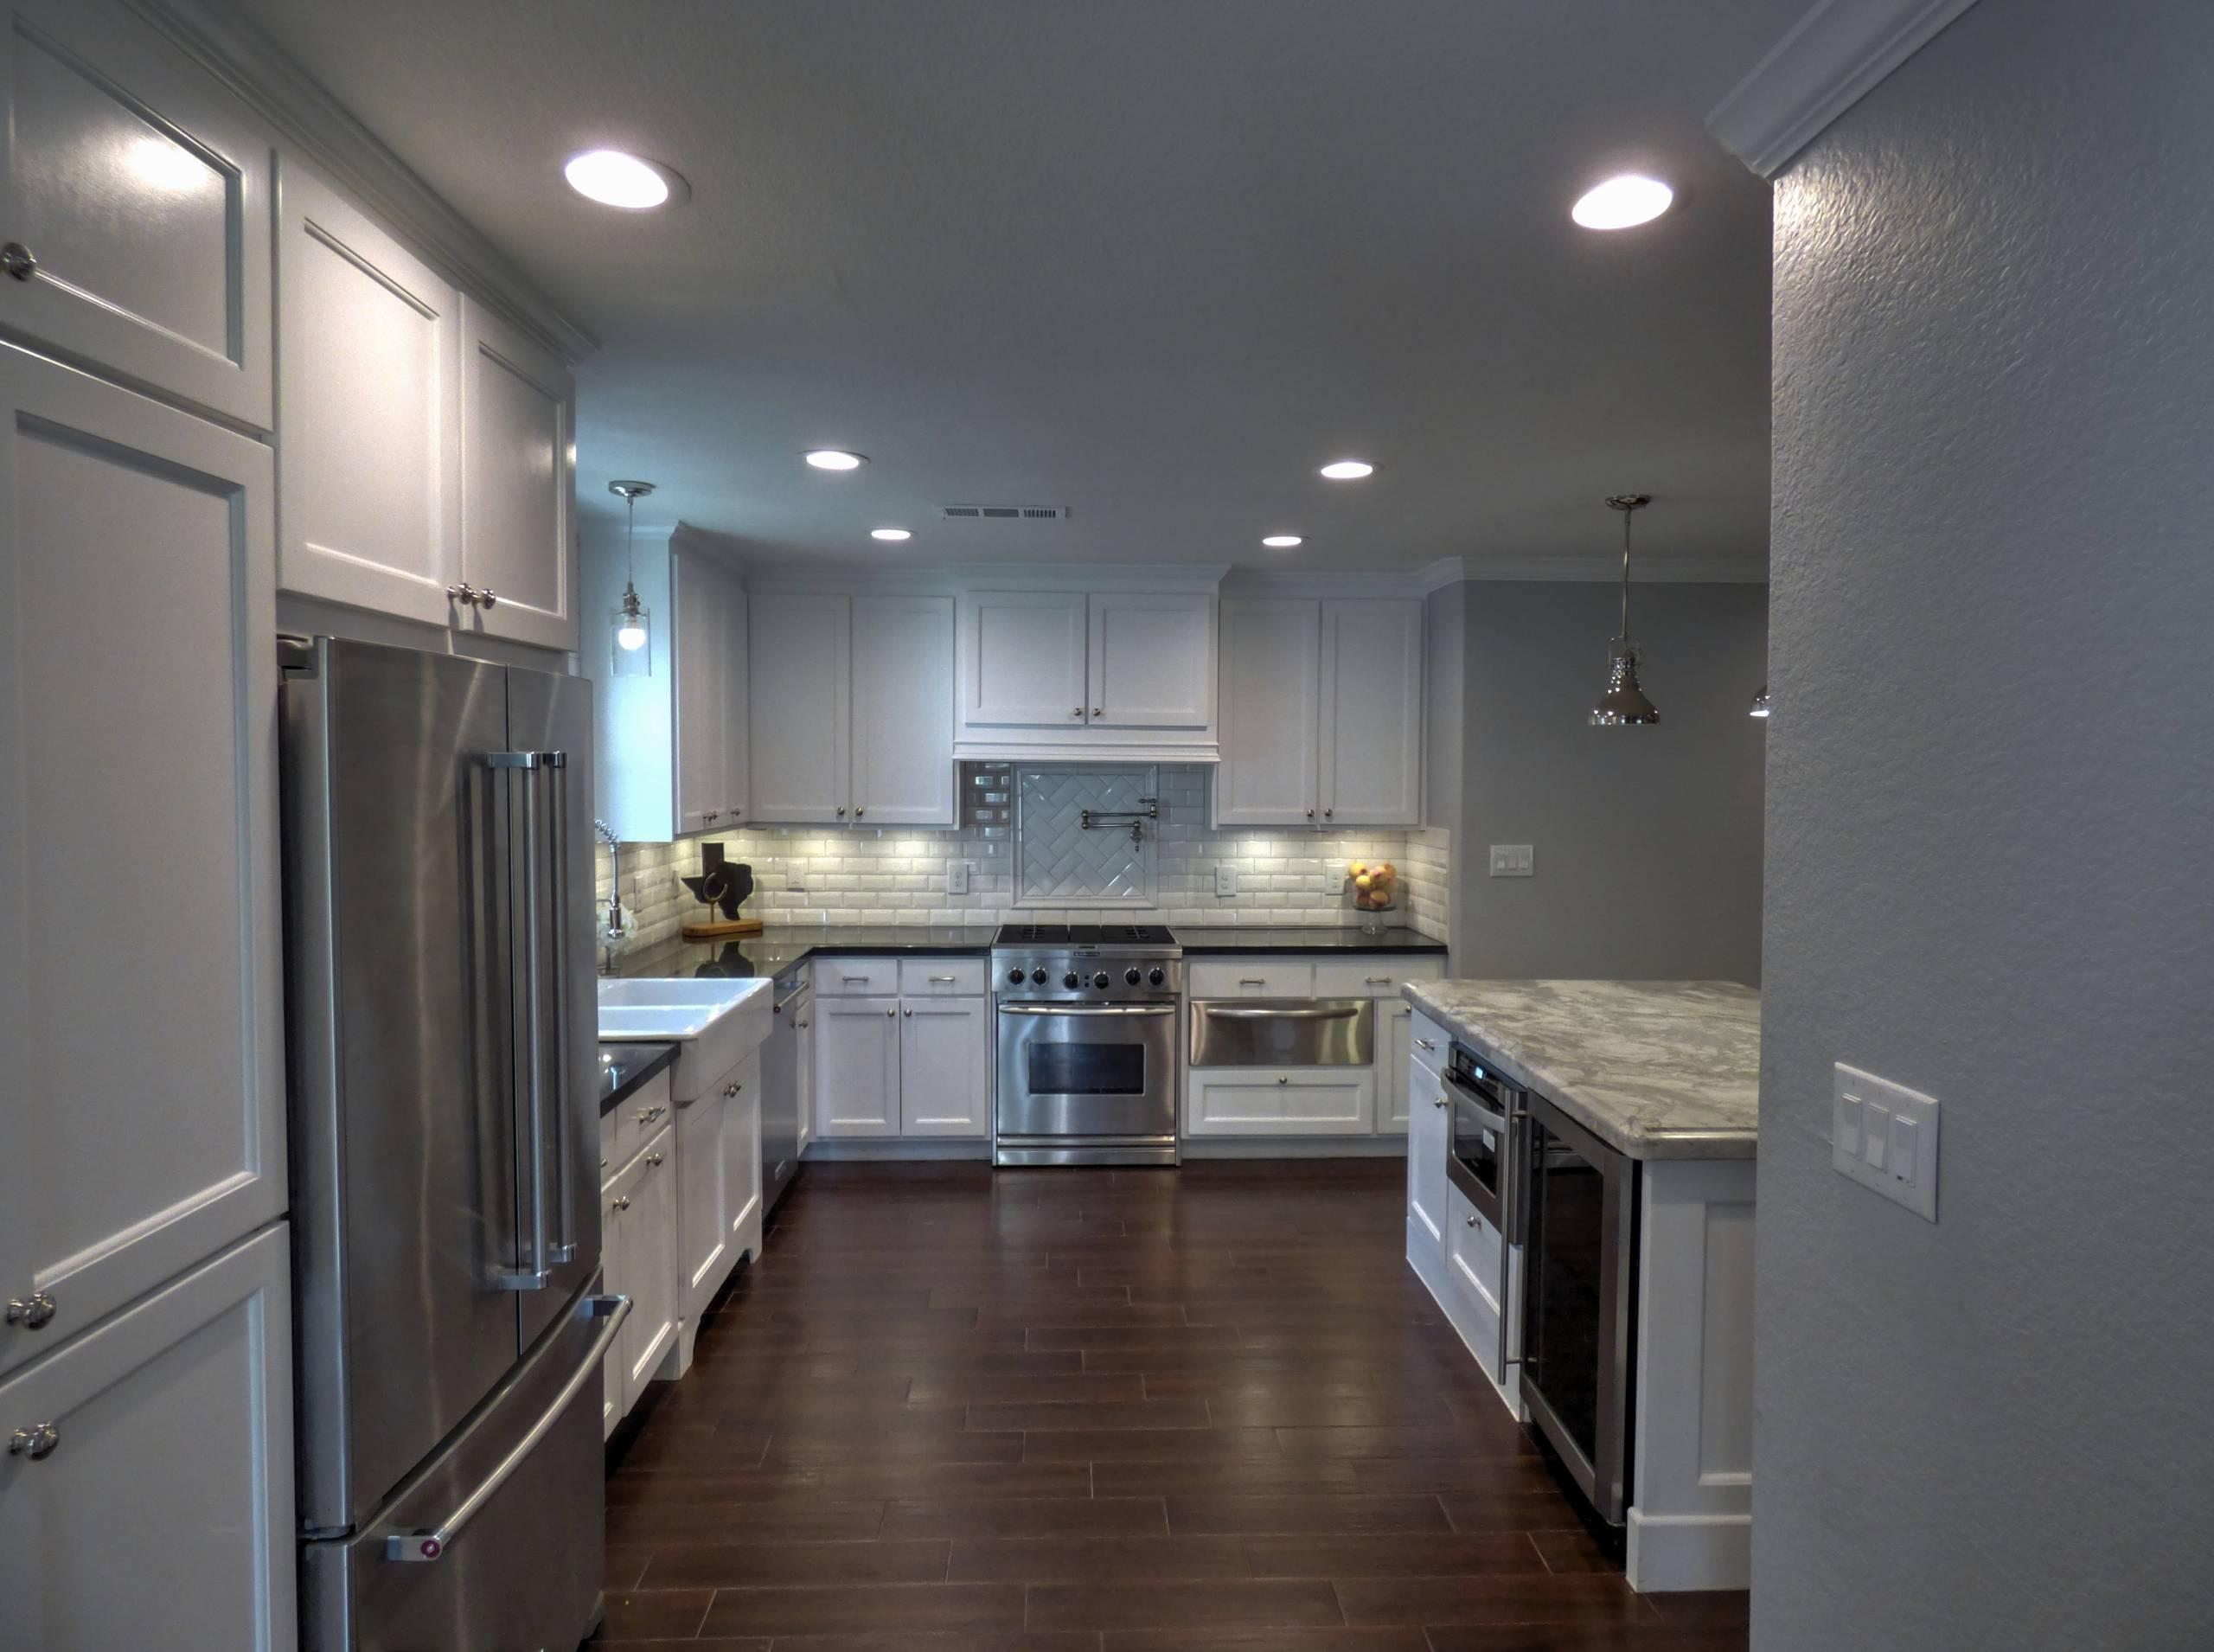 King Kitchen Range